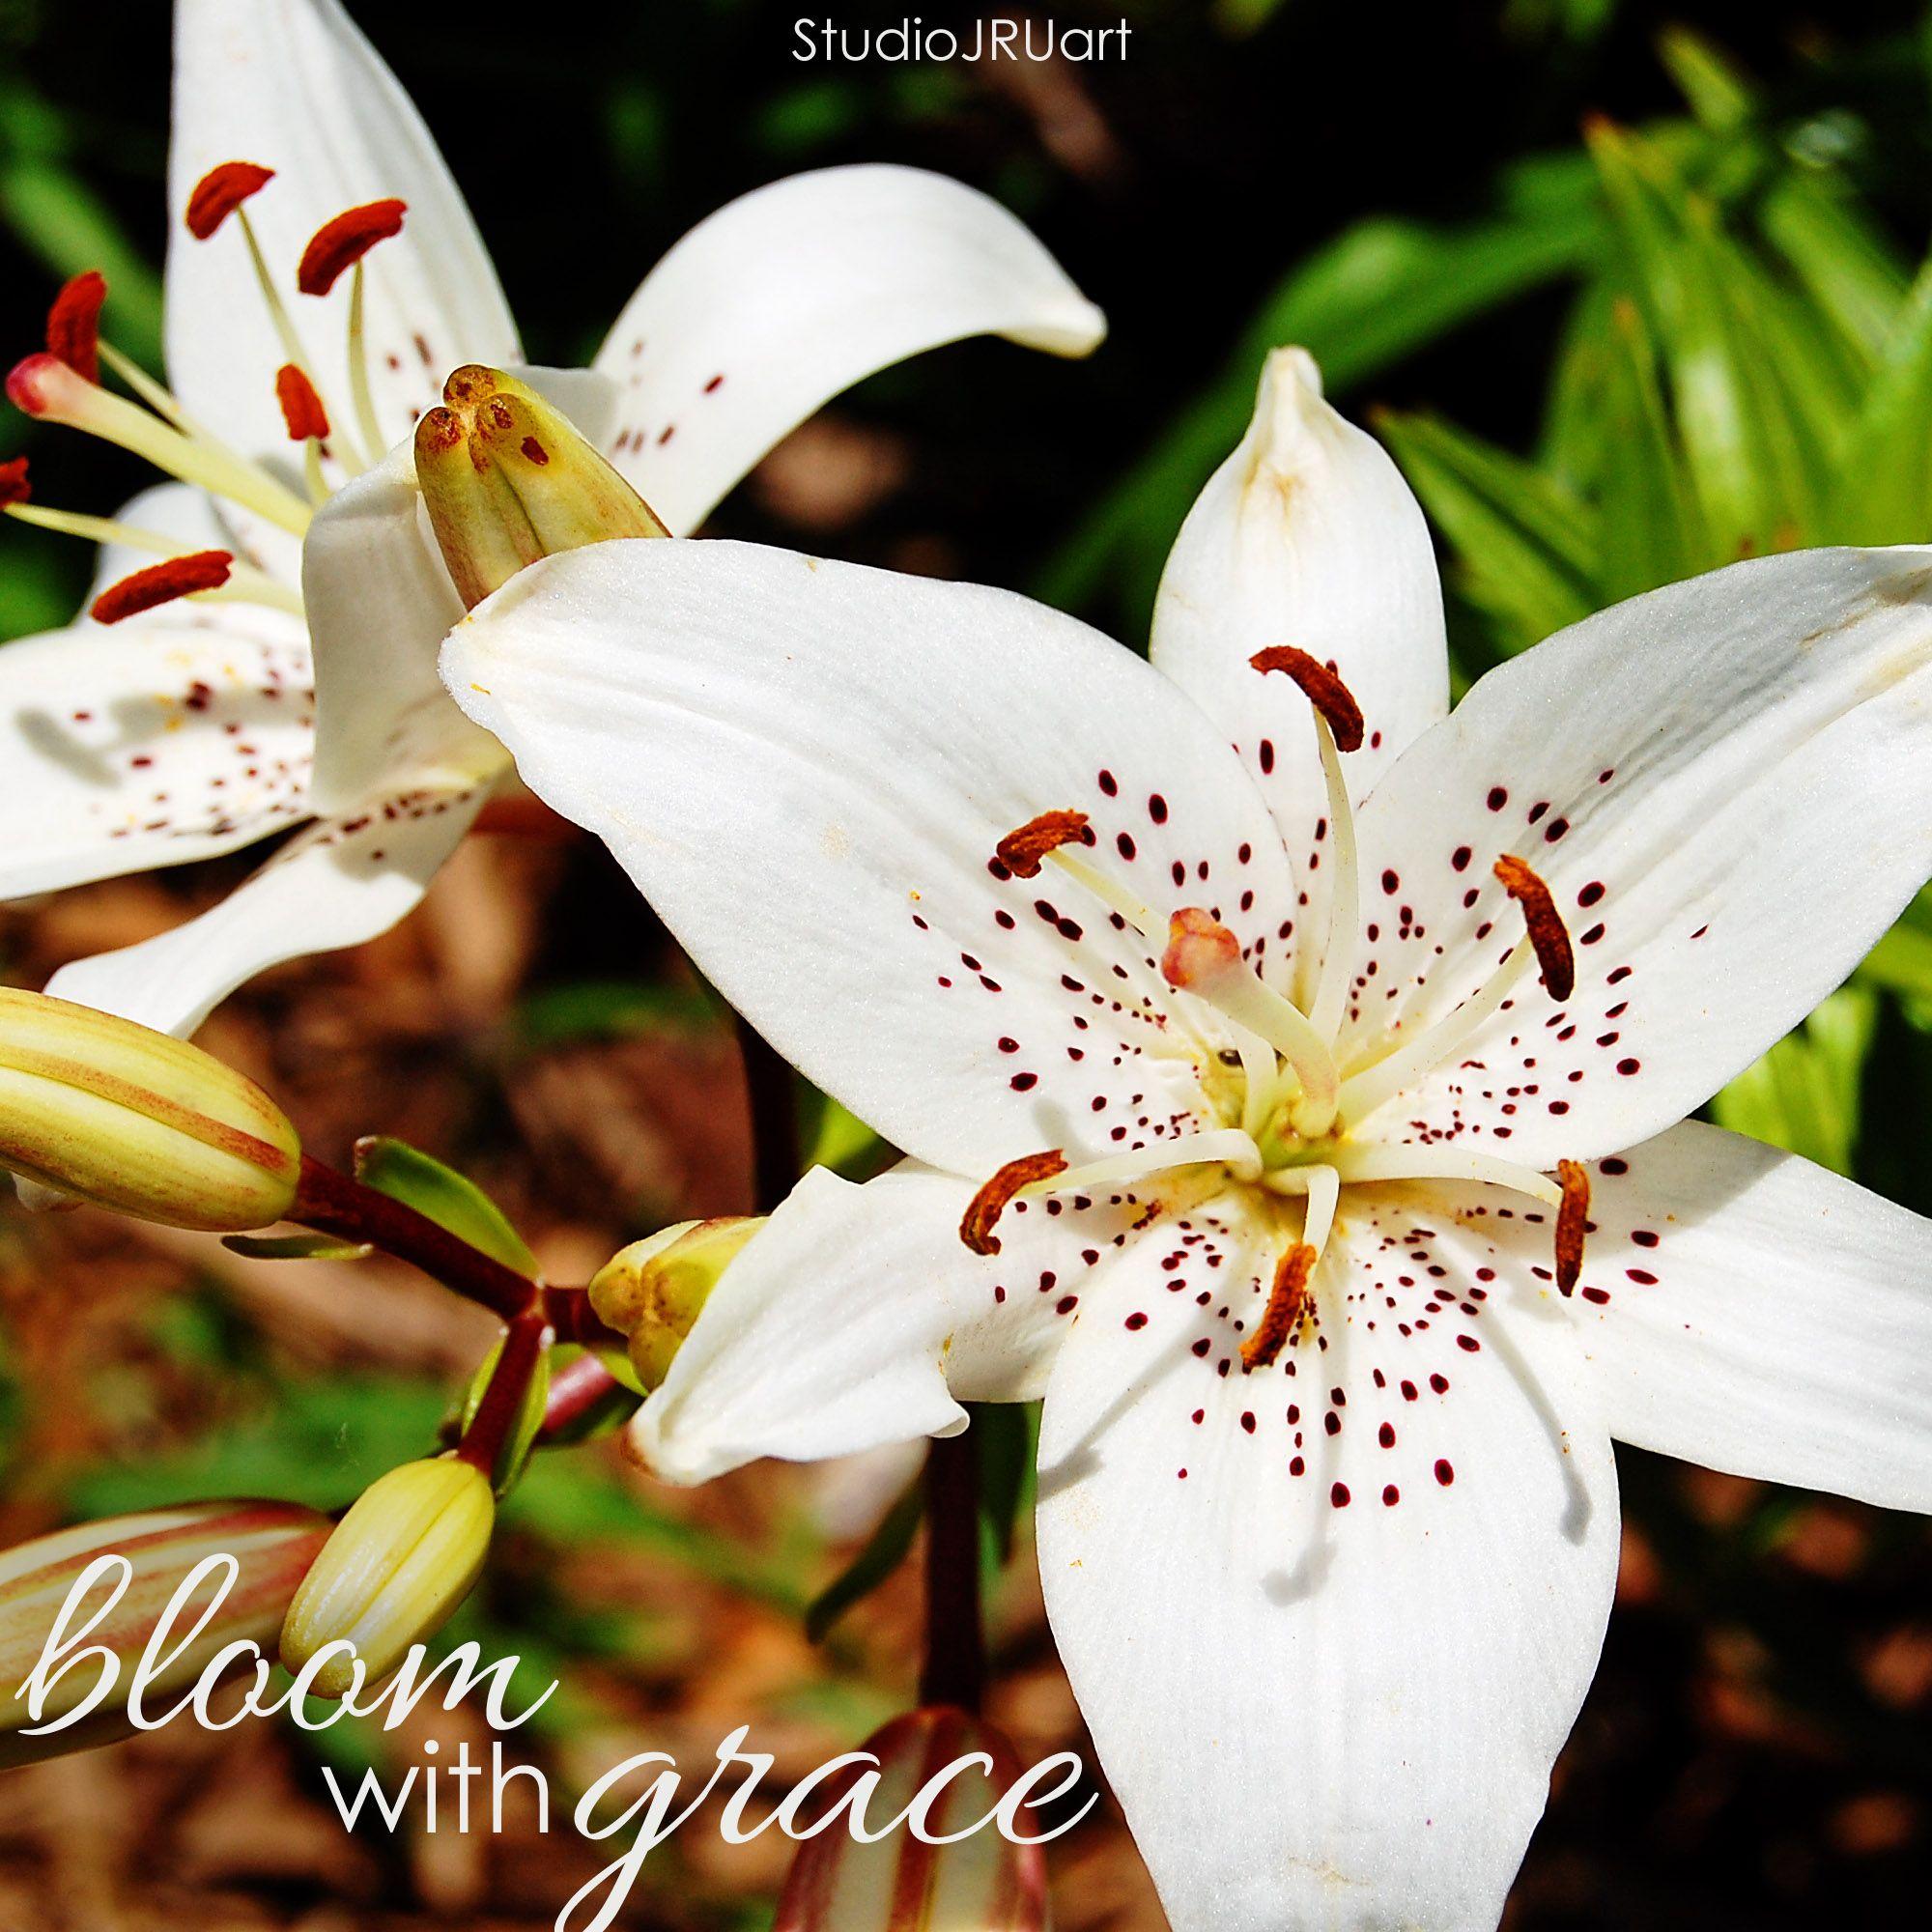 bloom with grace. grace encouragement inspire lilies